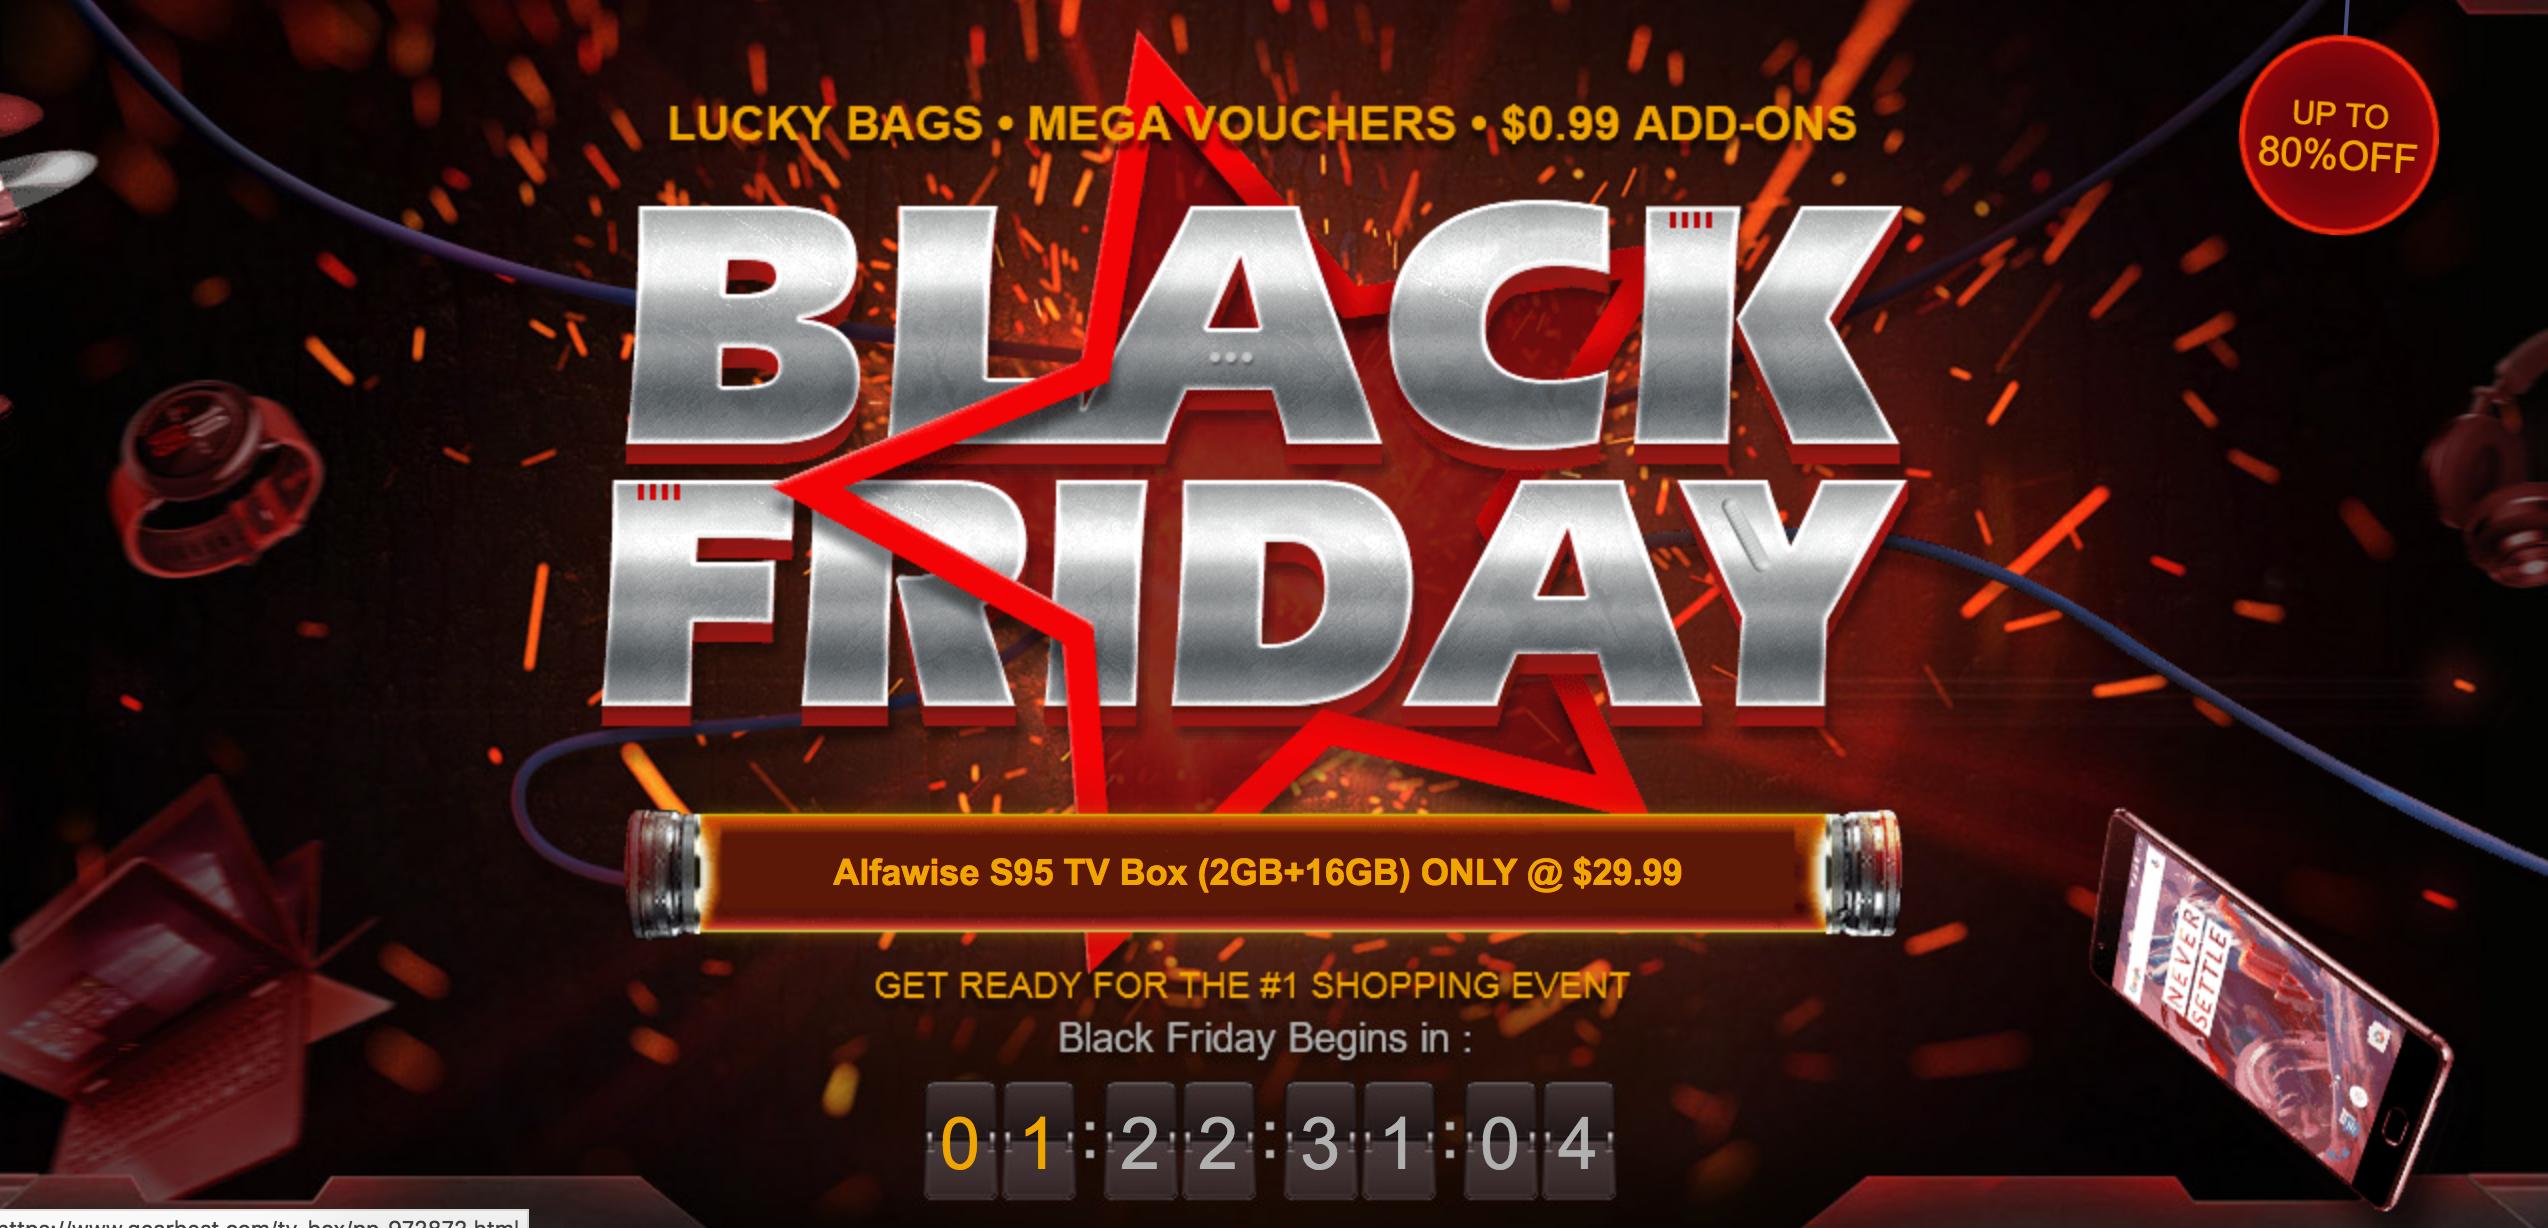 Black Friday Gear Best